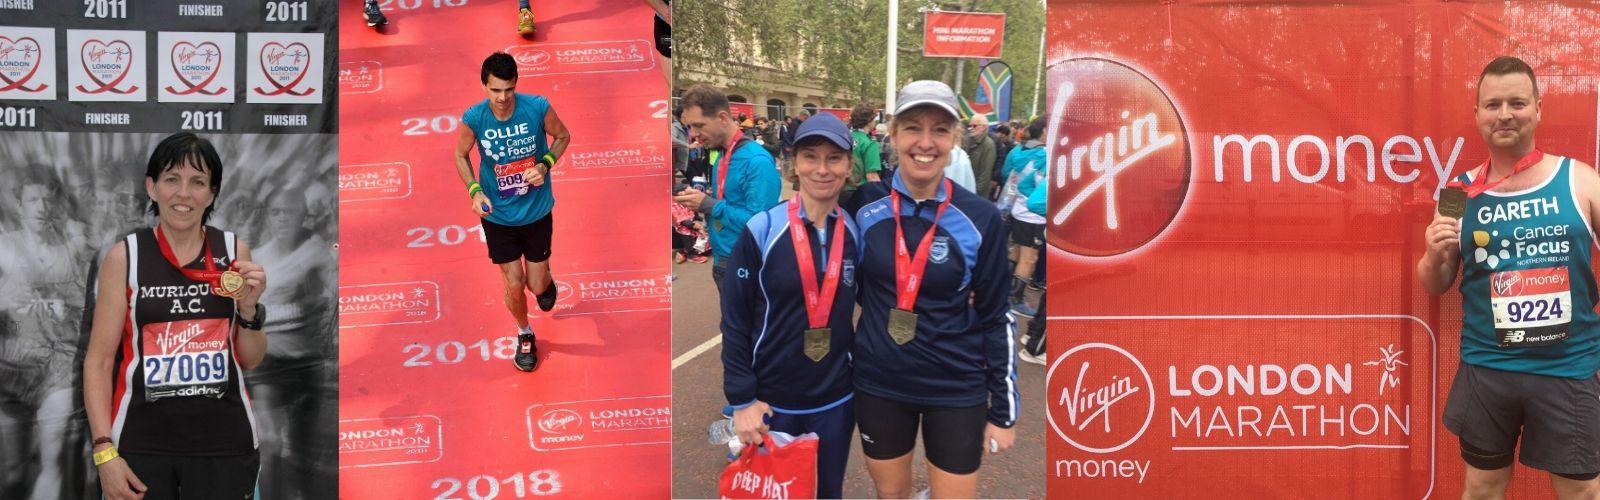 London Marathon – 3 October 2021